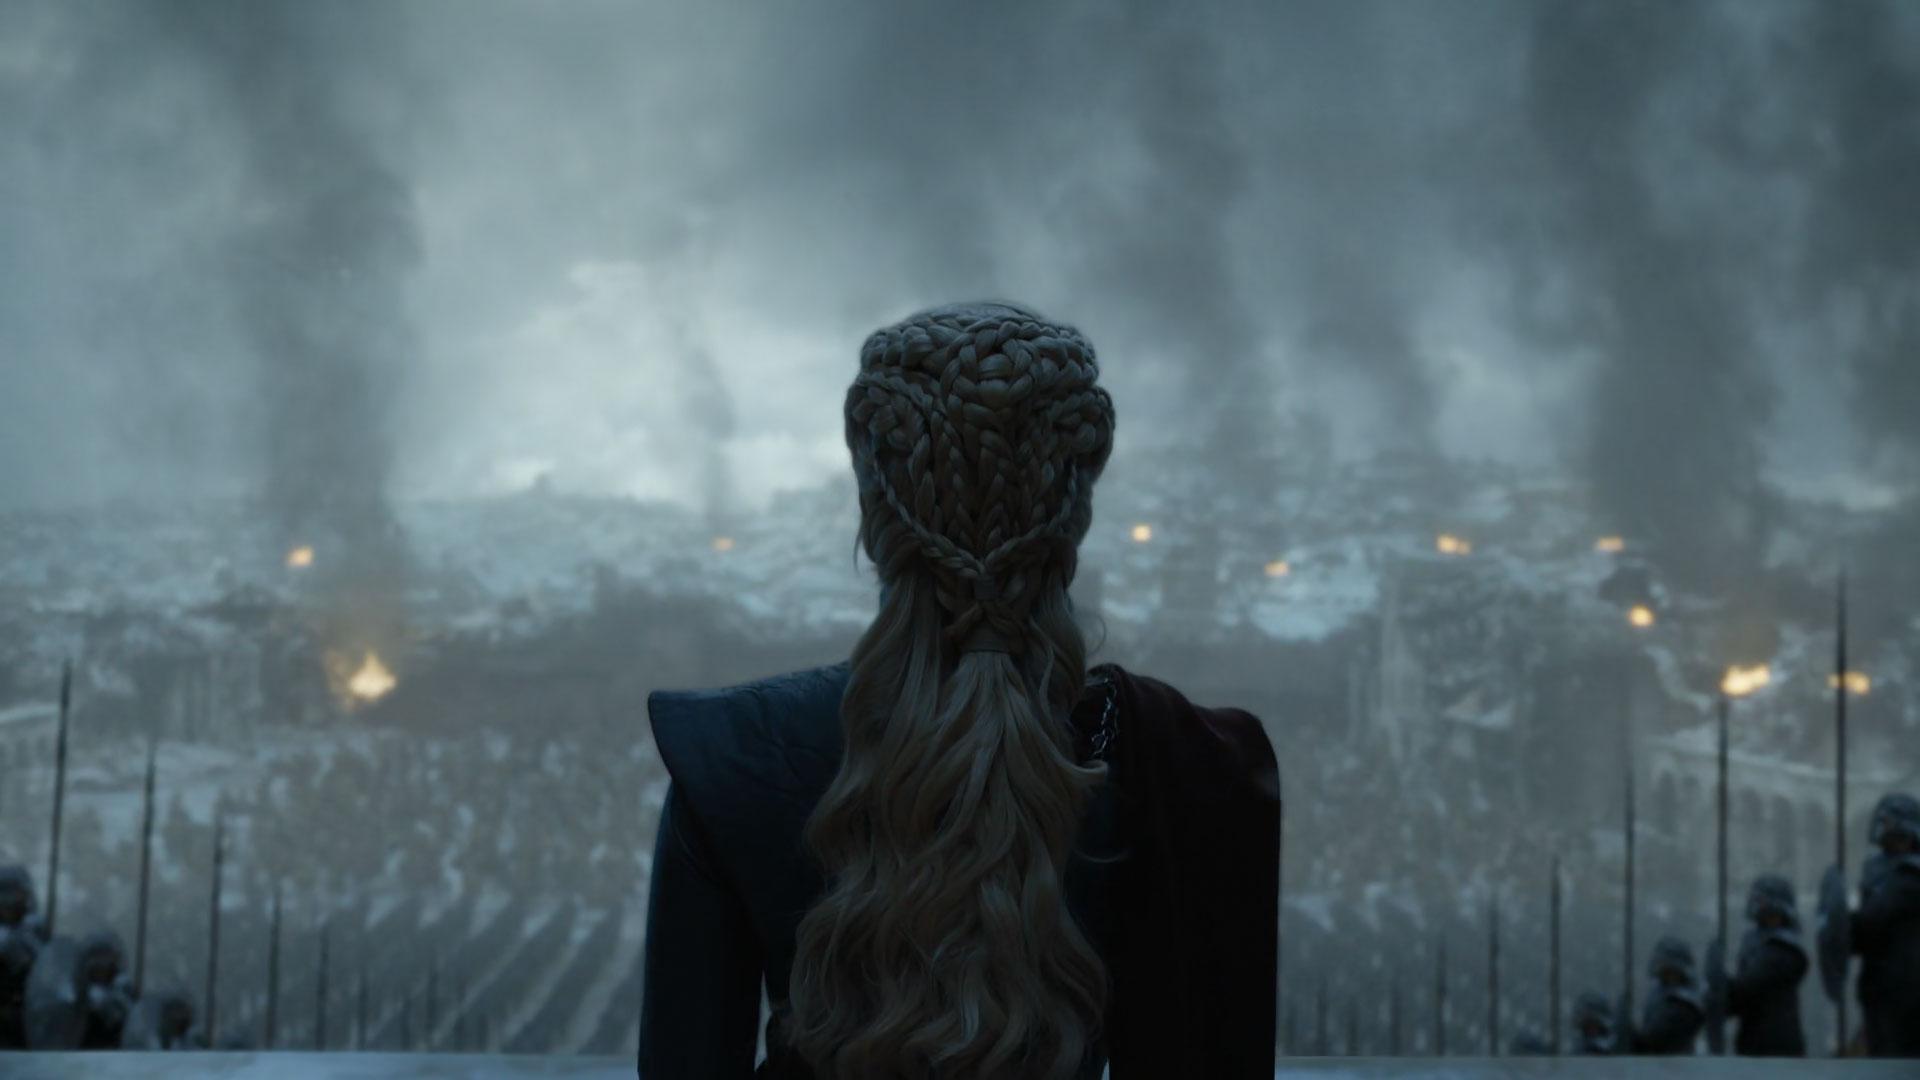 تصاویر قسمت ۶ فصل ۸ گیم آف ترونز (Game Of Thrones)